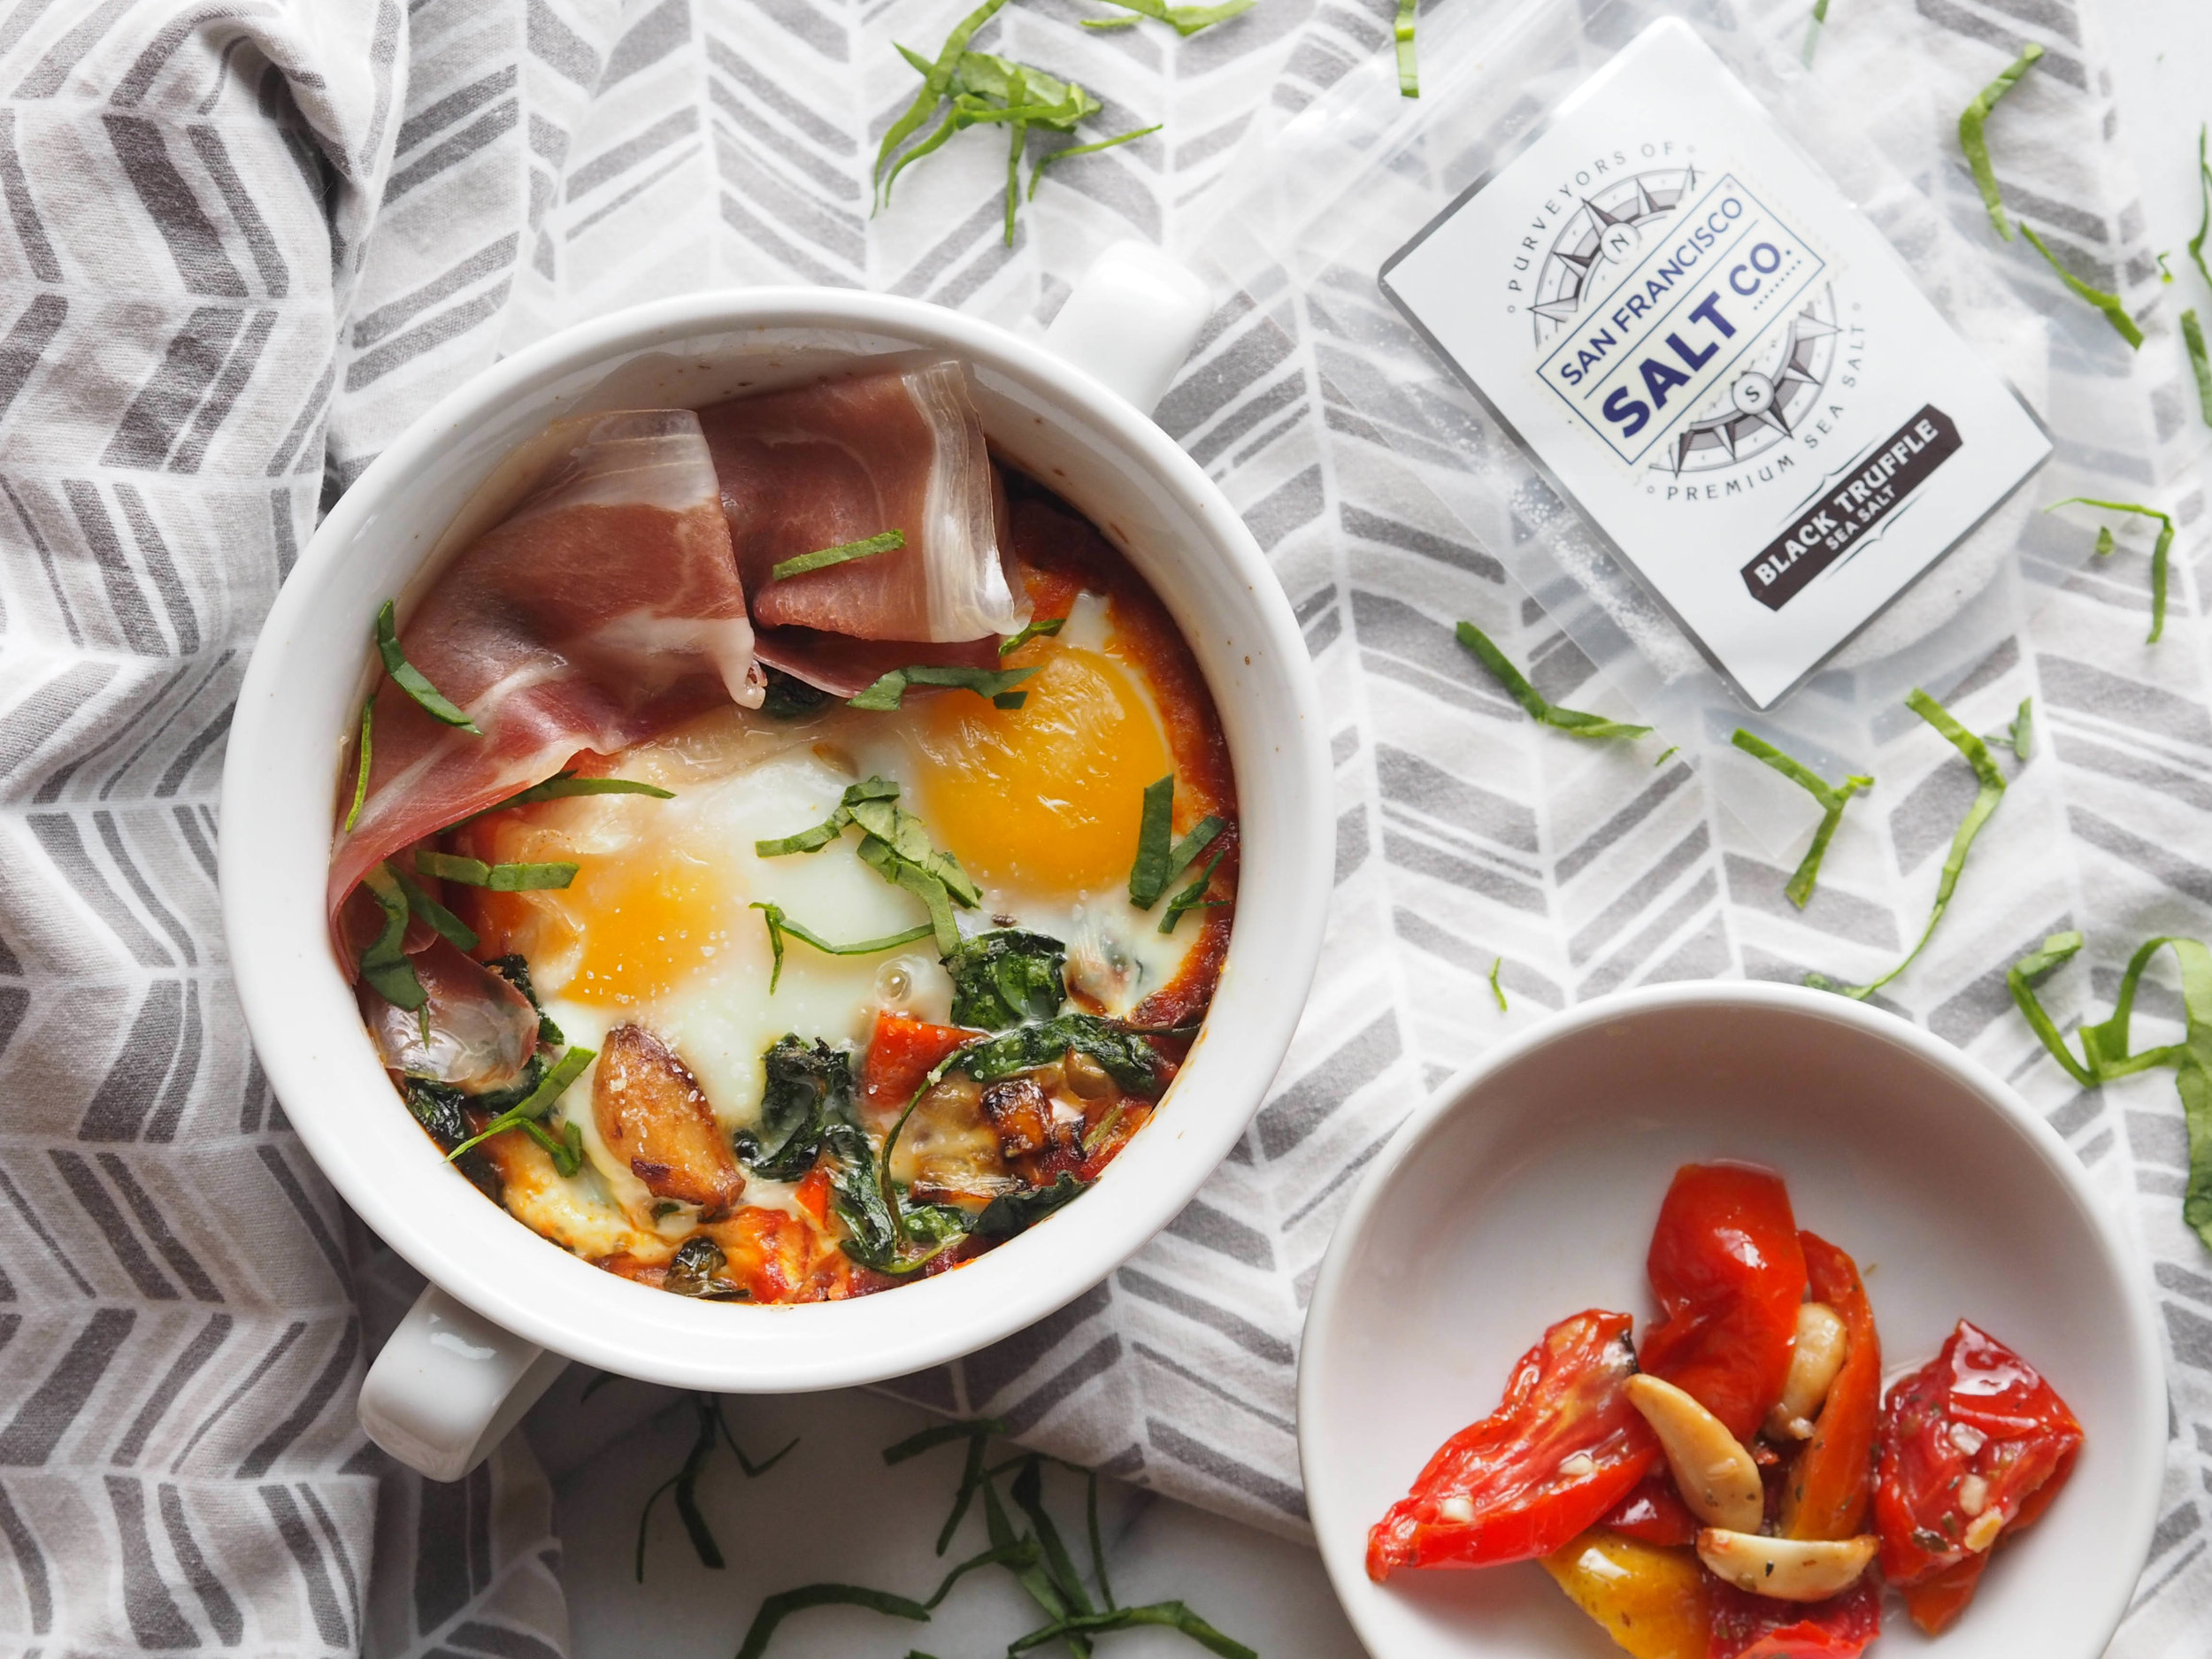 umami prosciutto baked eggs